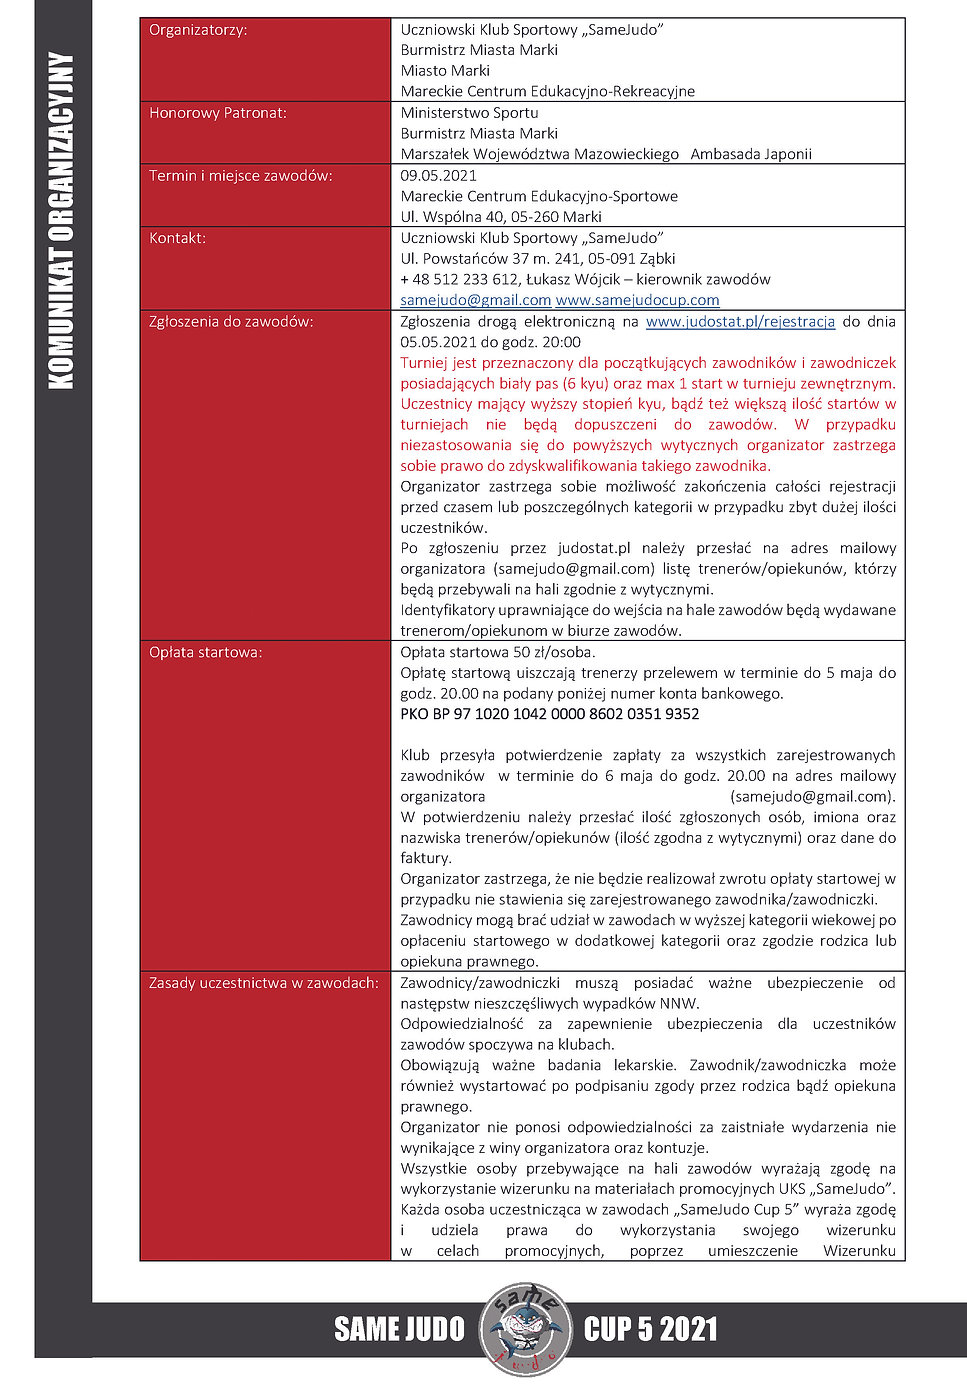 SJC 5 Komunikat - niedziela str 1.jpg